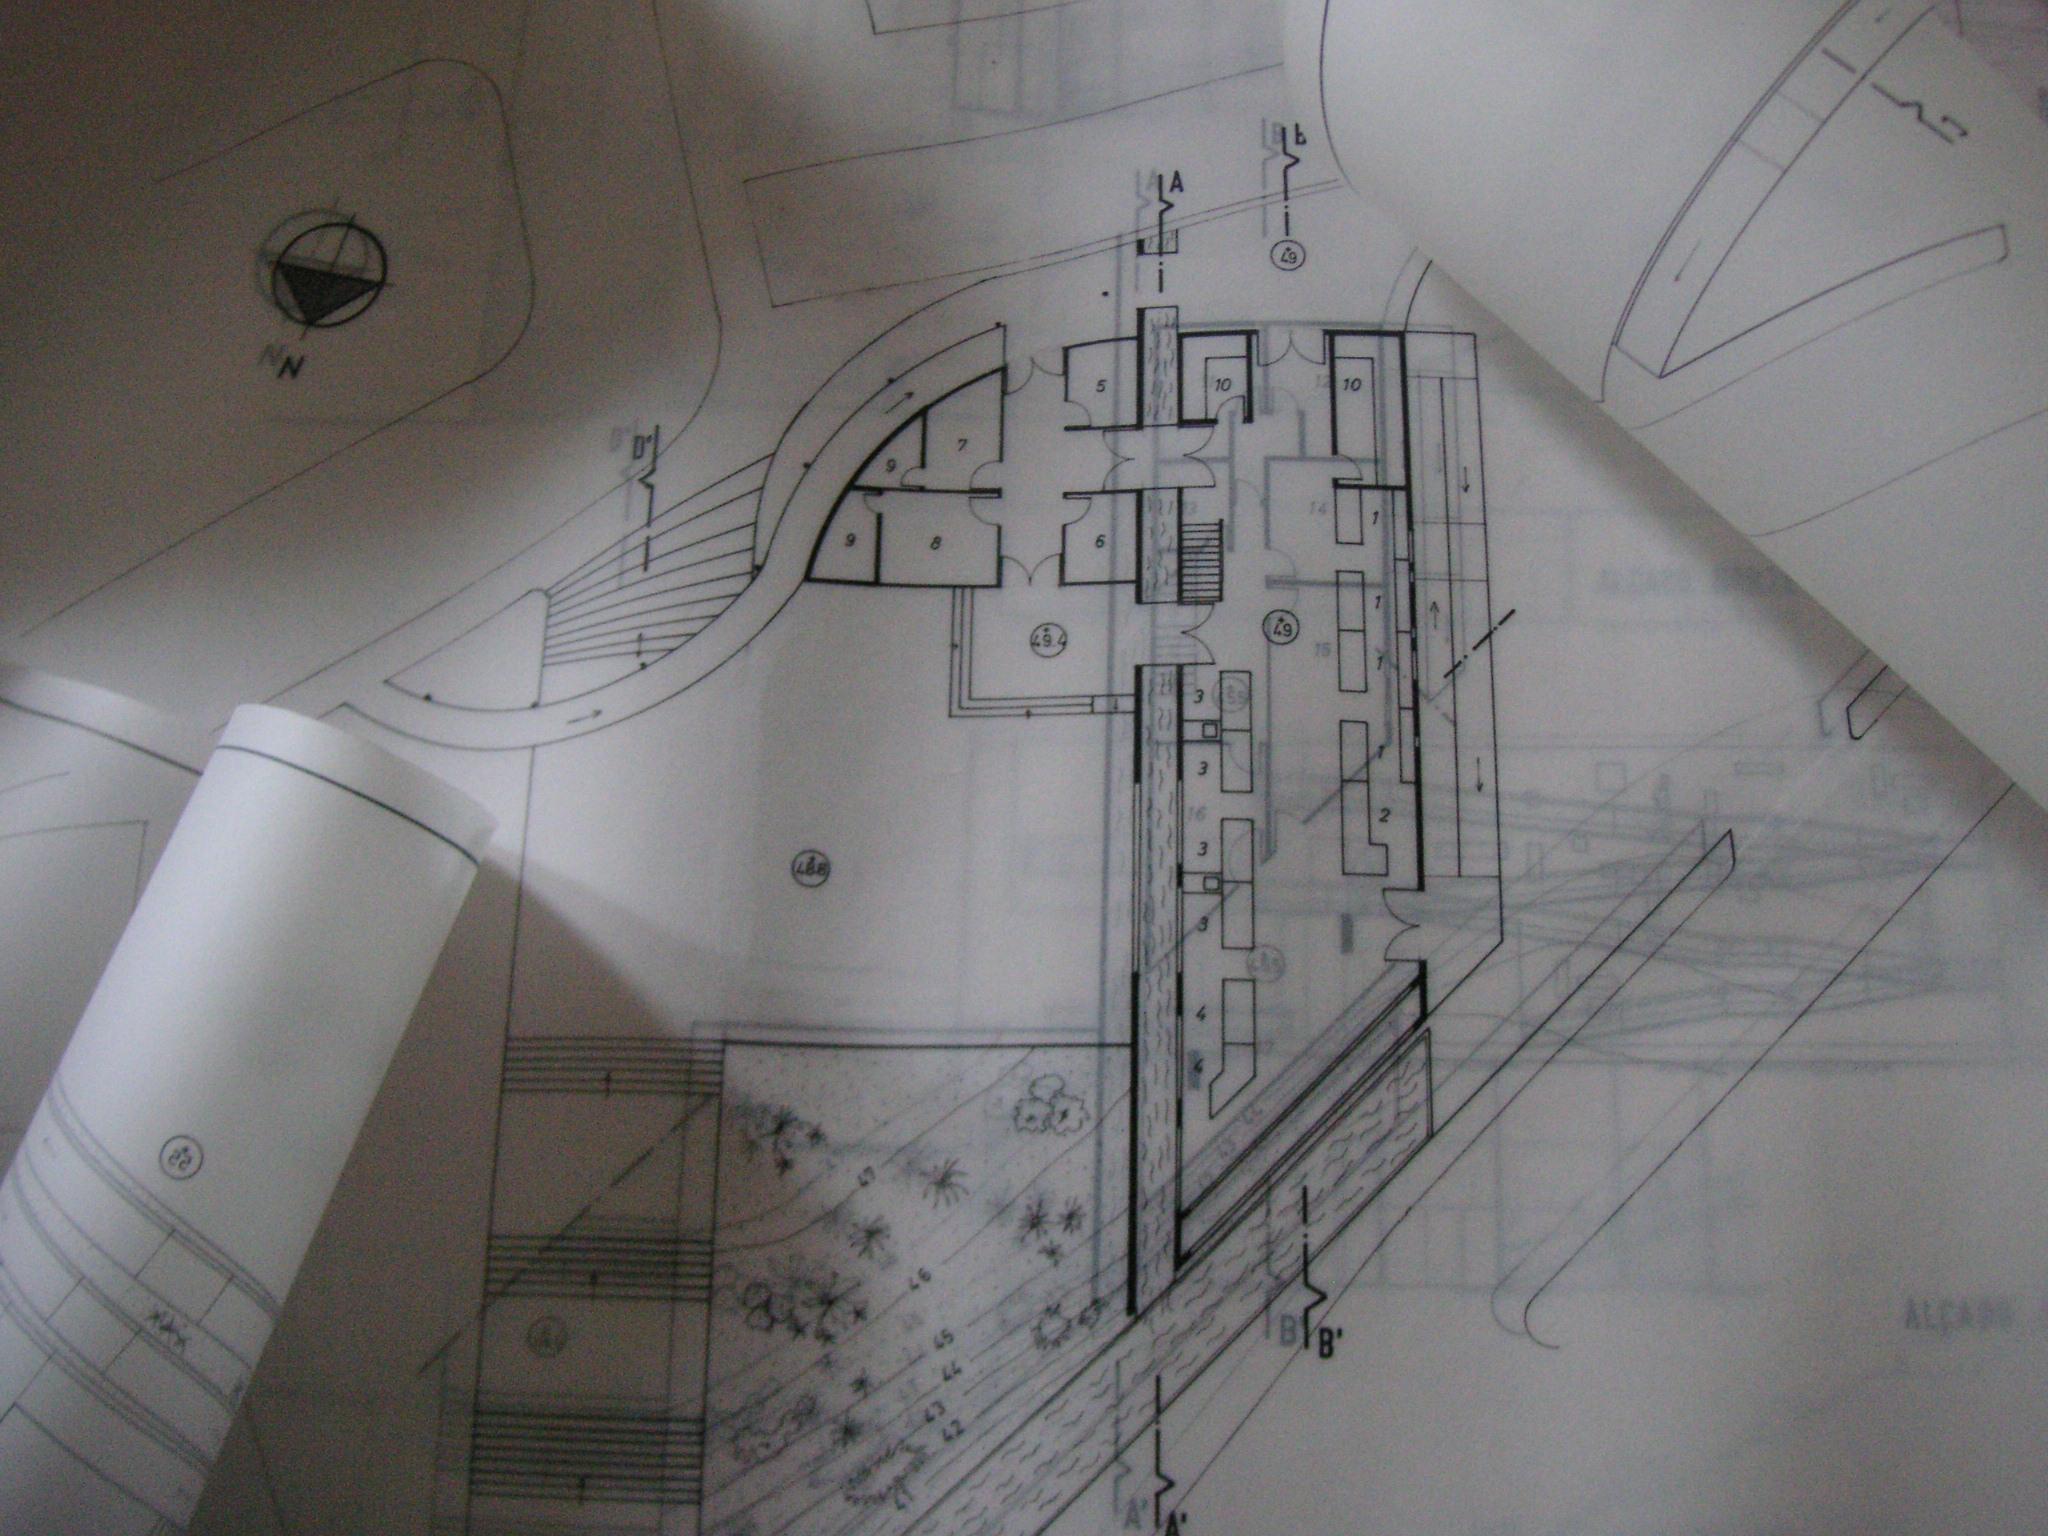 Market - Lower Ground Floor Plan, hand drawn. © 2017 Isabel Barros Architects